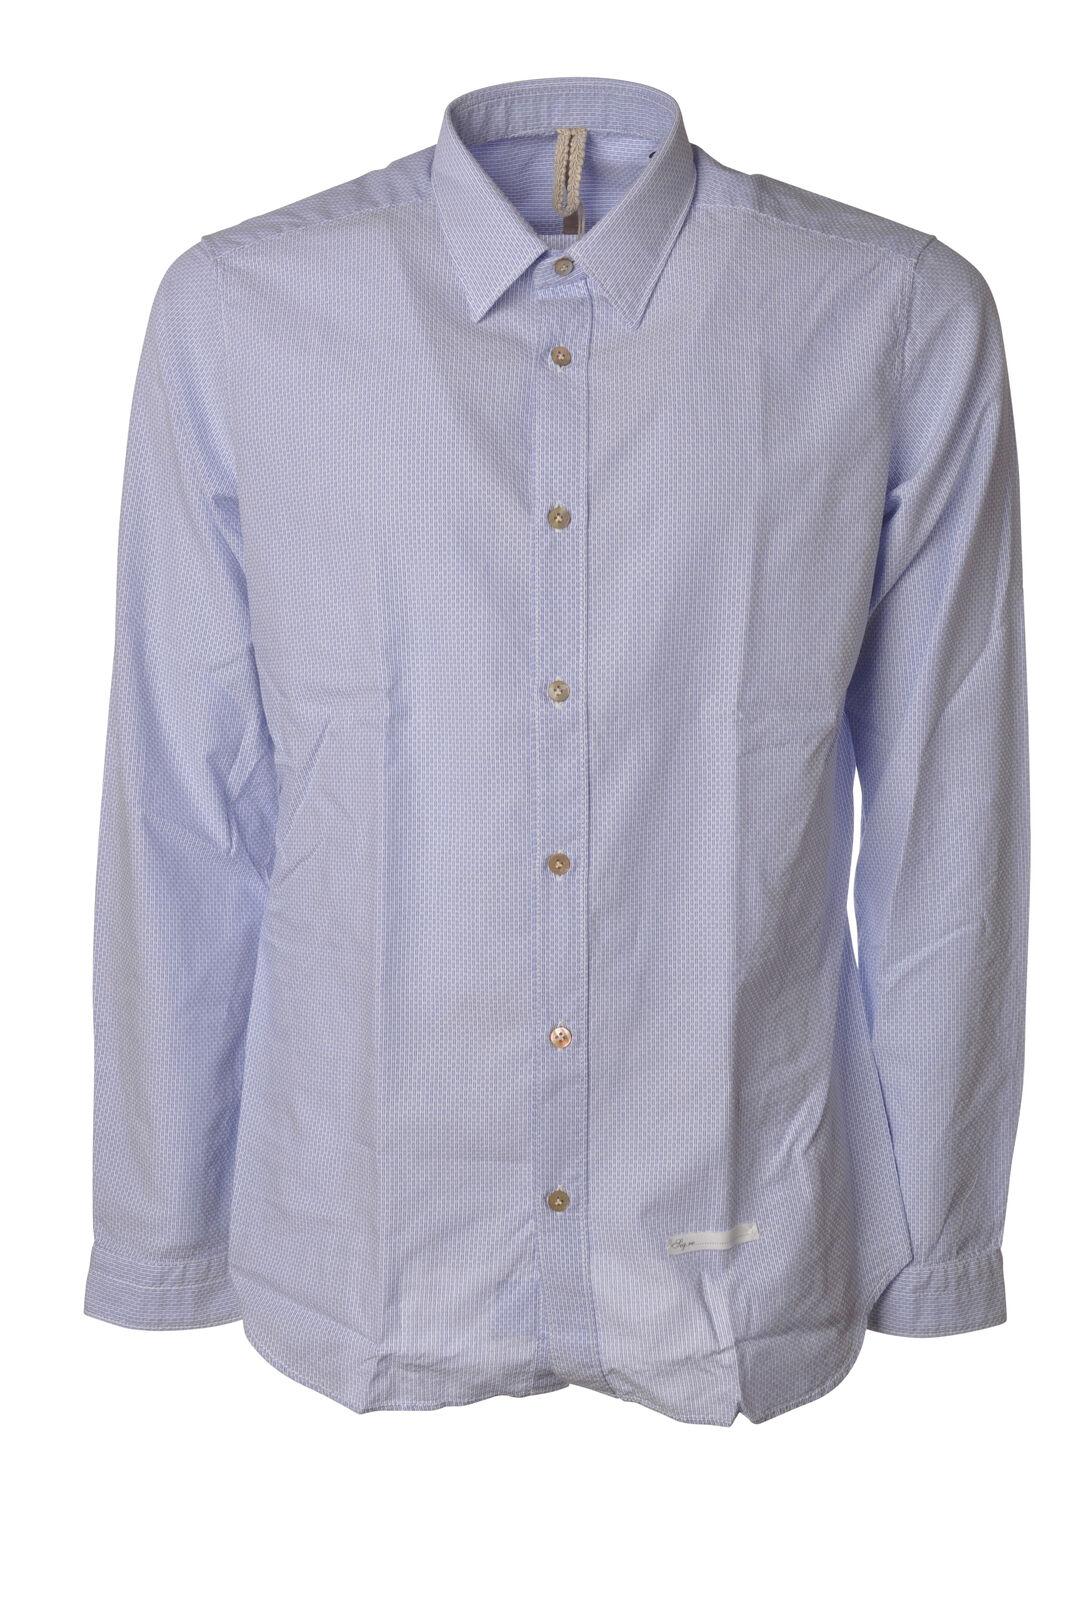 Dnl - Shirts-Shirt - Man - Fantasy - 5630228L181307